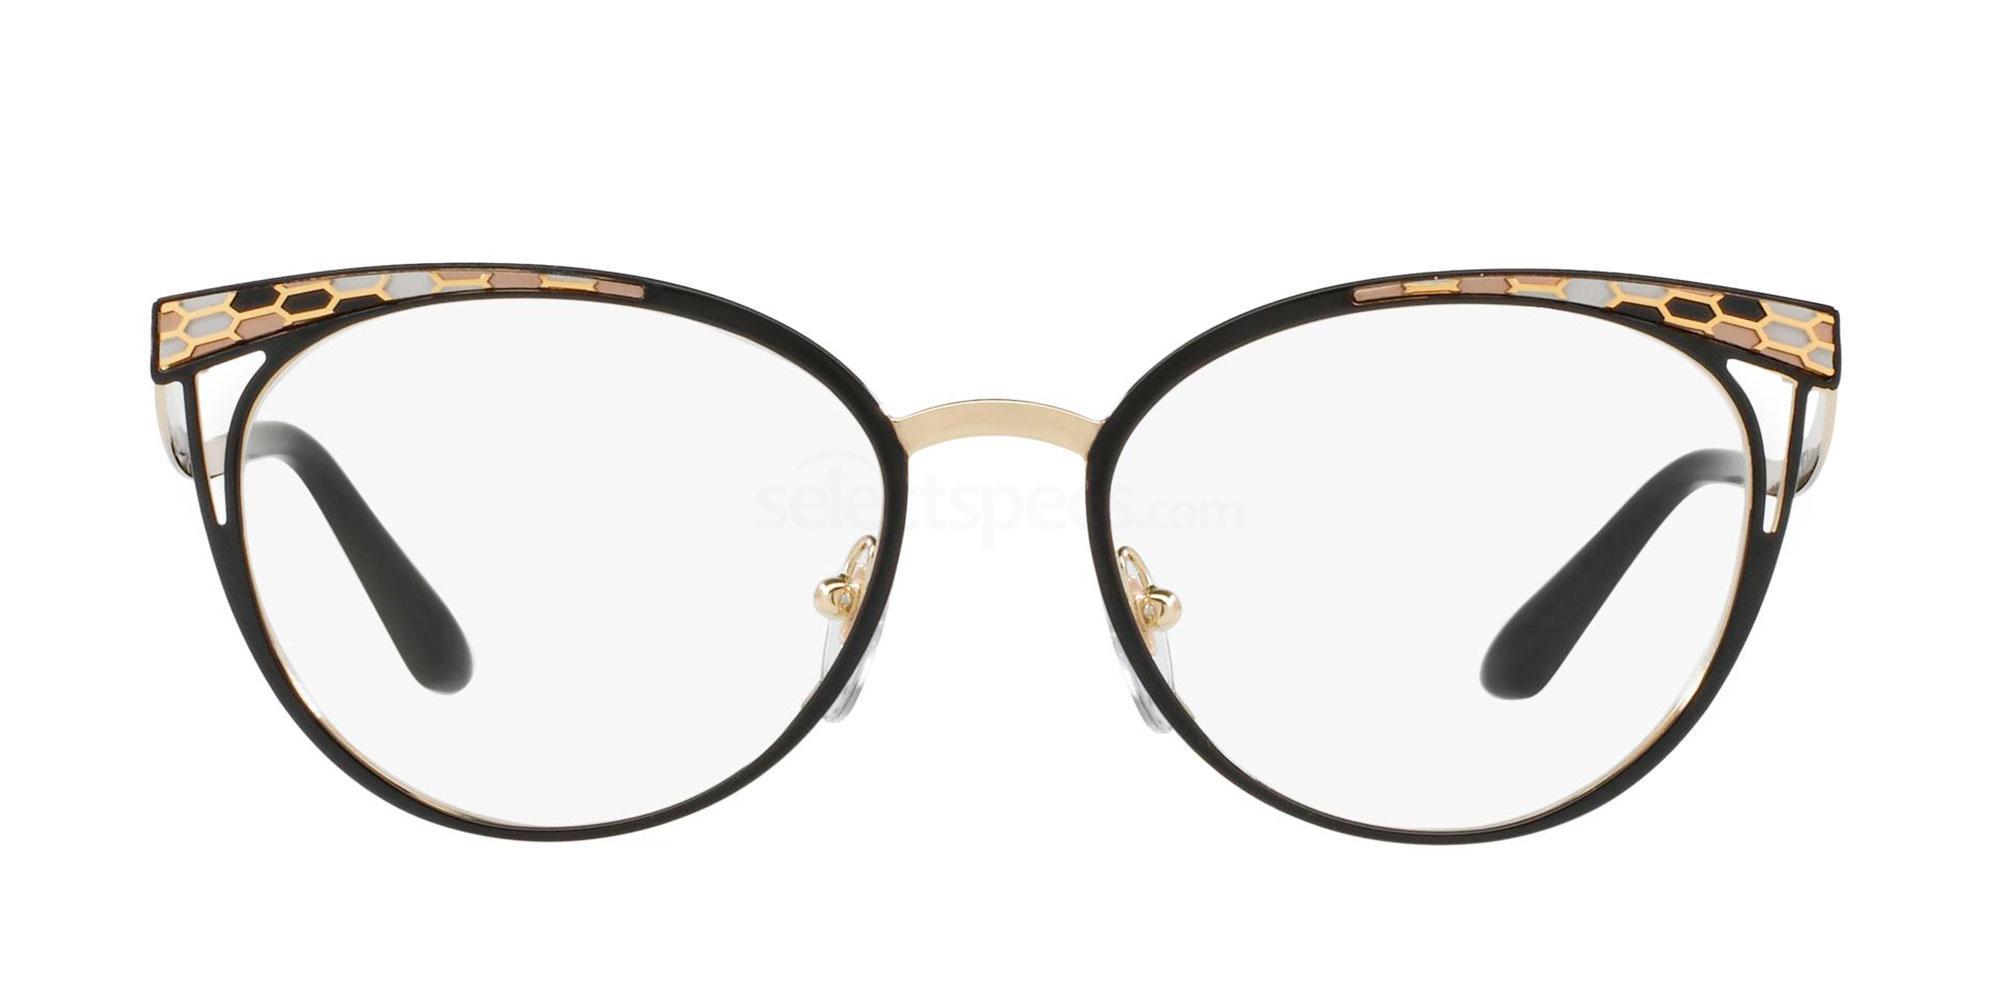 2018 BV2186 Glasses, Bvlgari